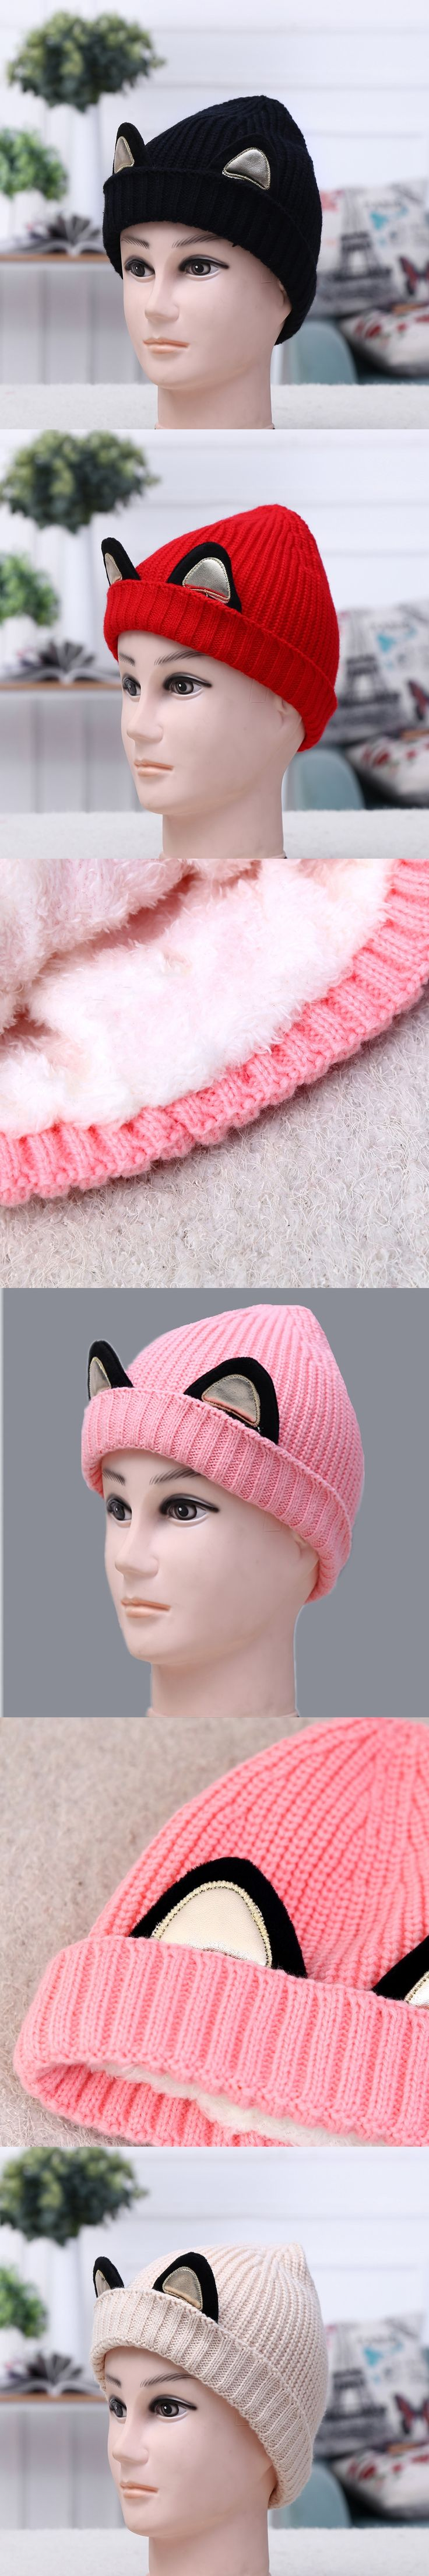 2018 Lovely Mom & Child Boy Girls Pom Pom Winter cat ear Caps Warm Fur Pom Bobble Knit Beanie Hat parenting fleece crochet Cap